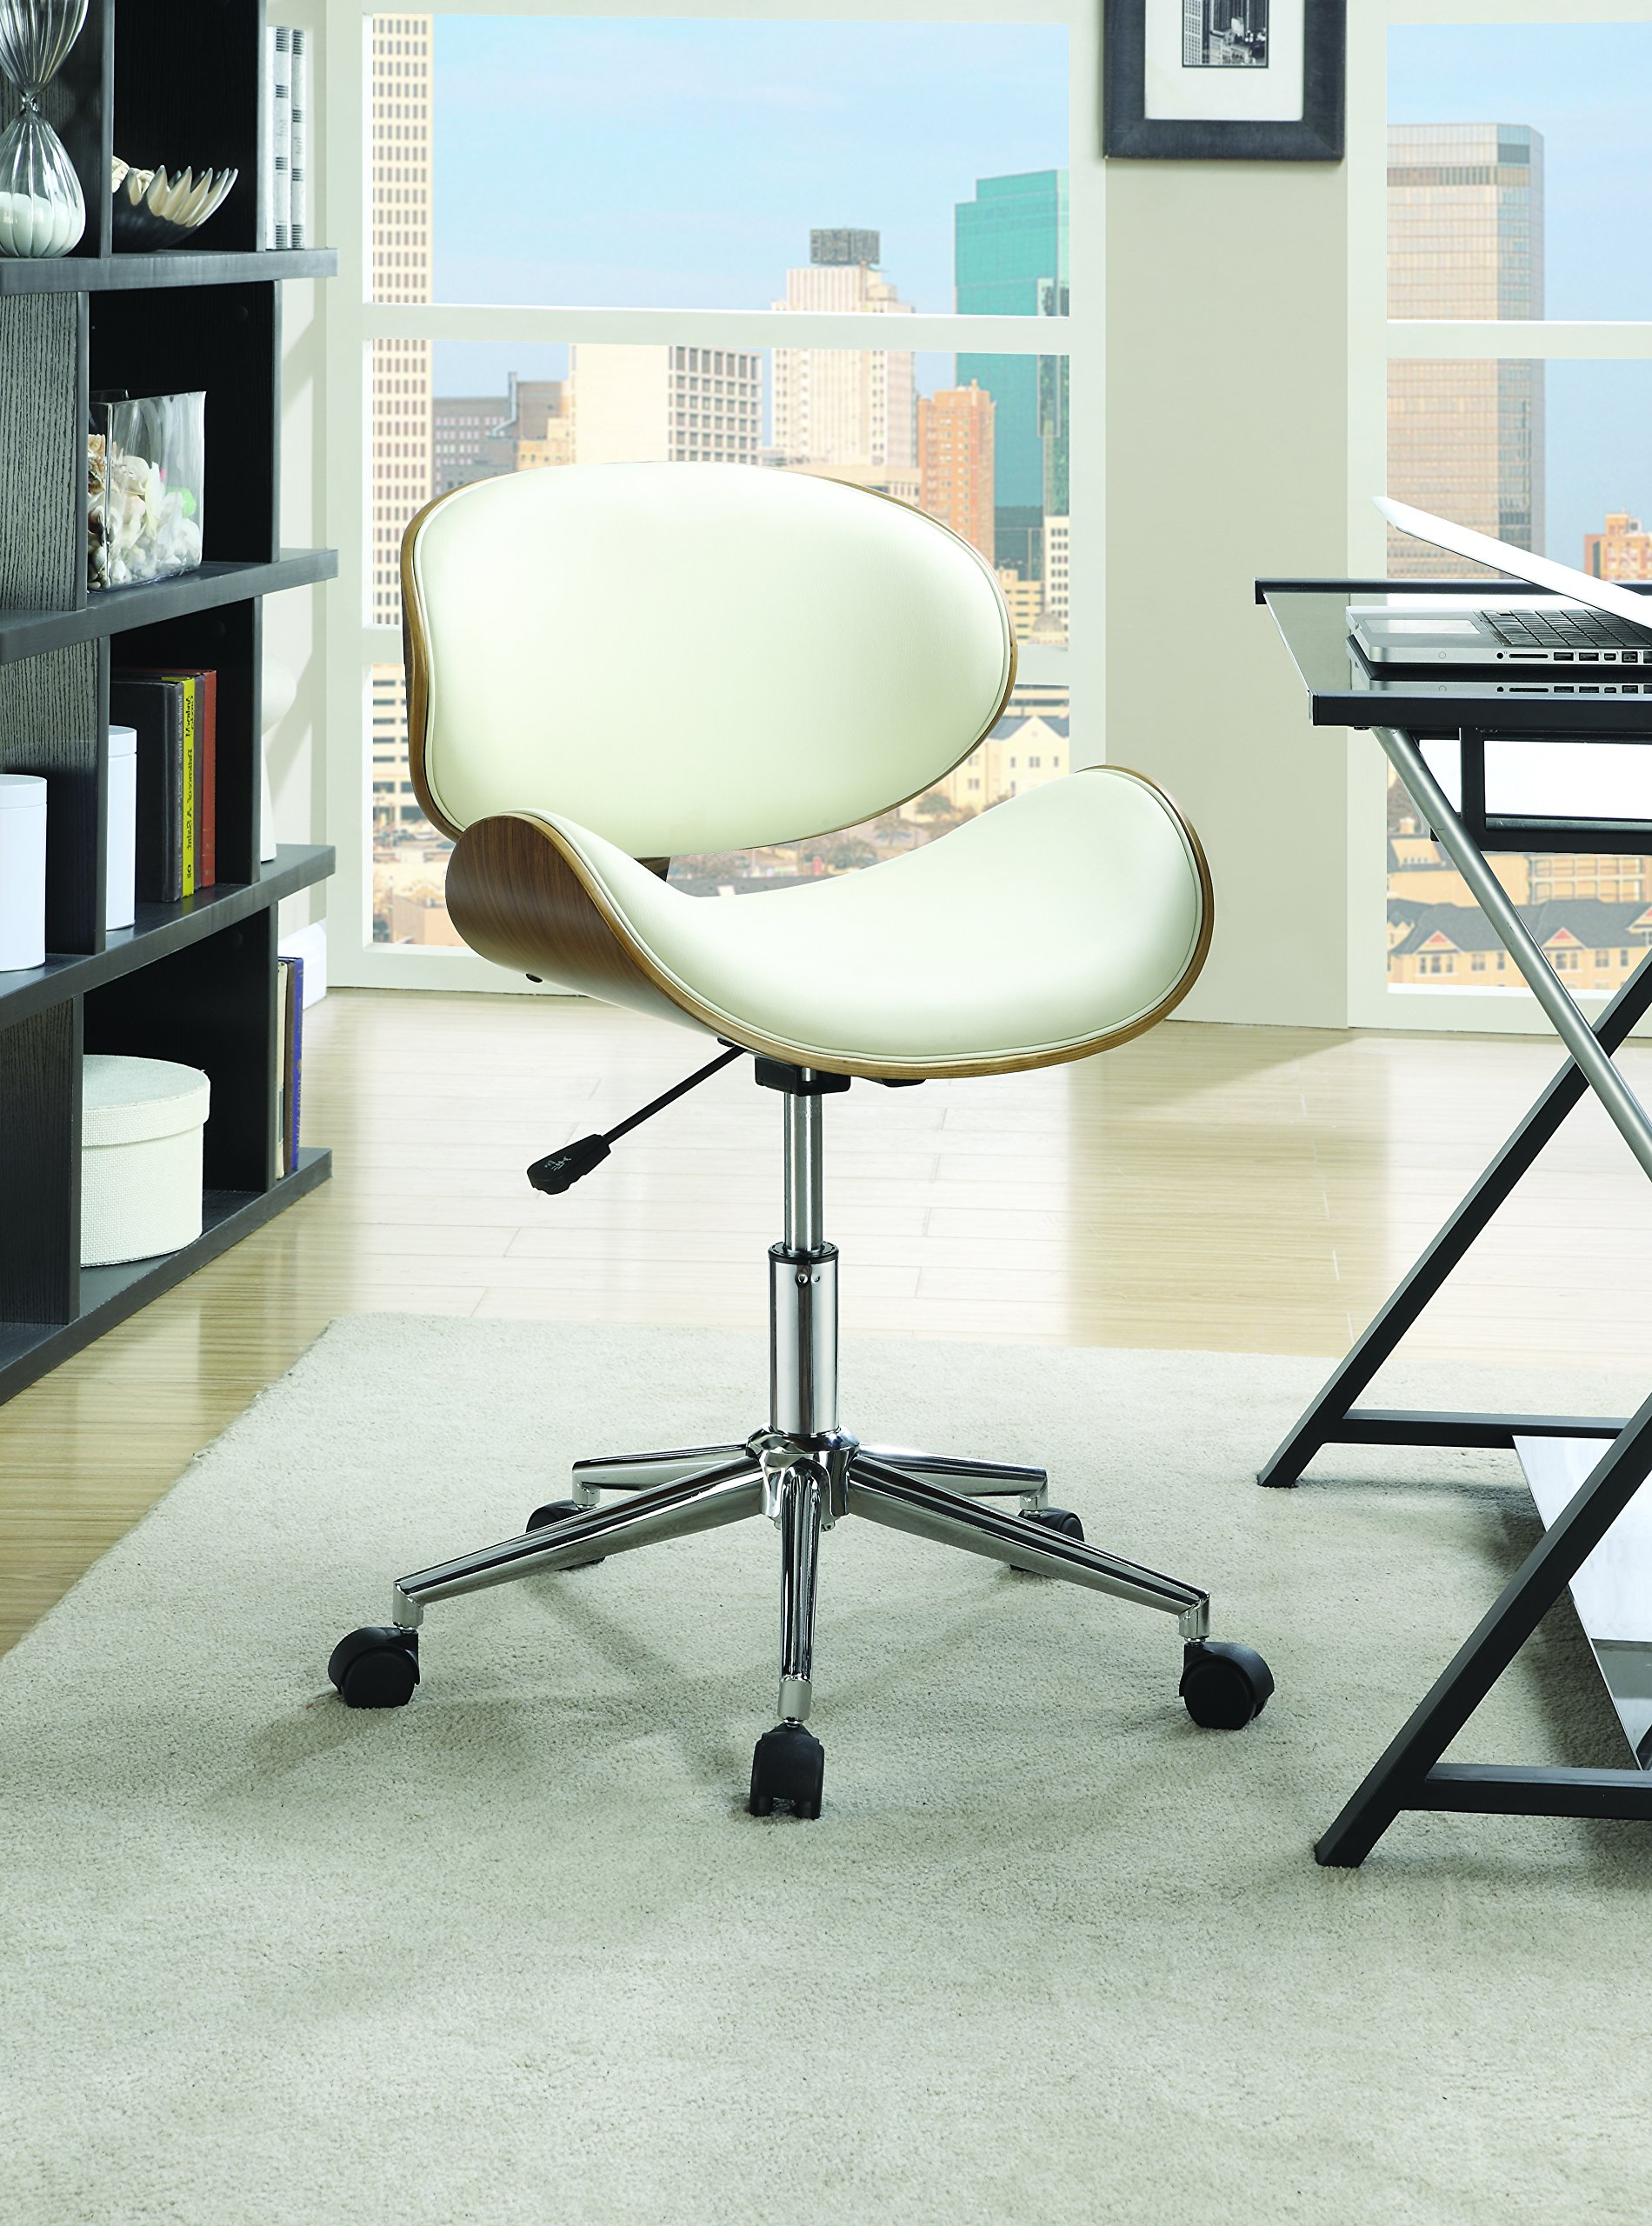 Coaster Home Furnishings 800615 Leatherette Office Chair, NULL, Ecru by Coaster Home Furnishings (Image #2)